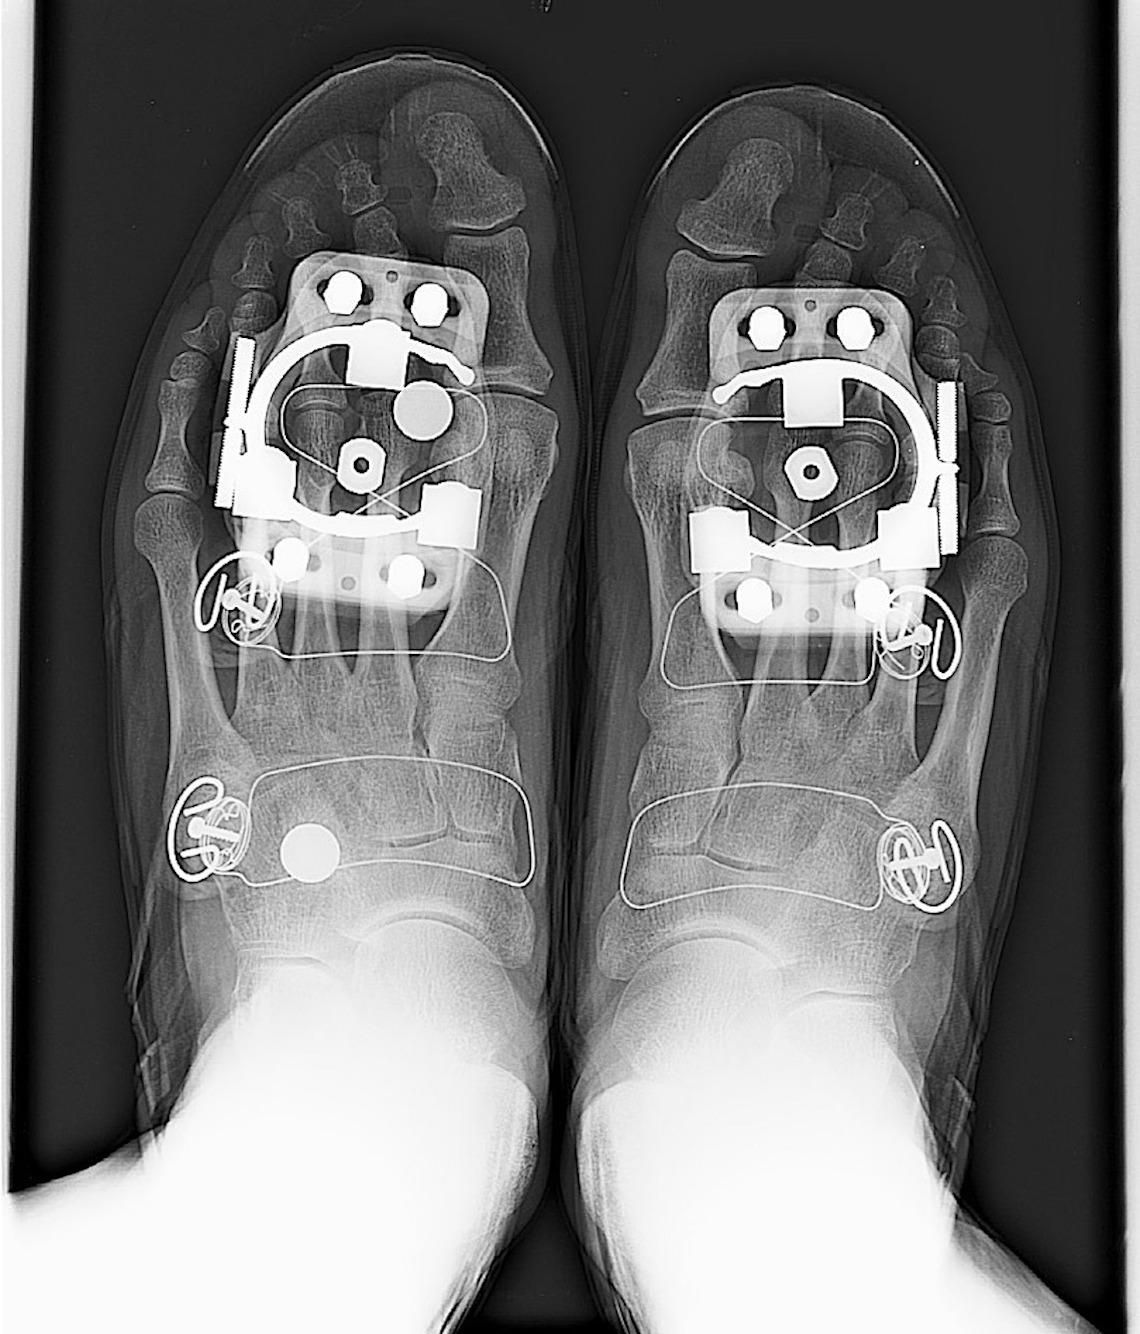 Paul Perret Cycling_x-ray_art_prints_4